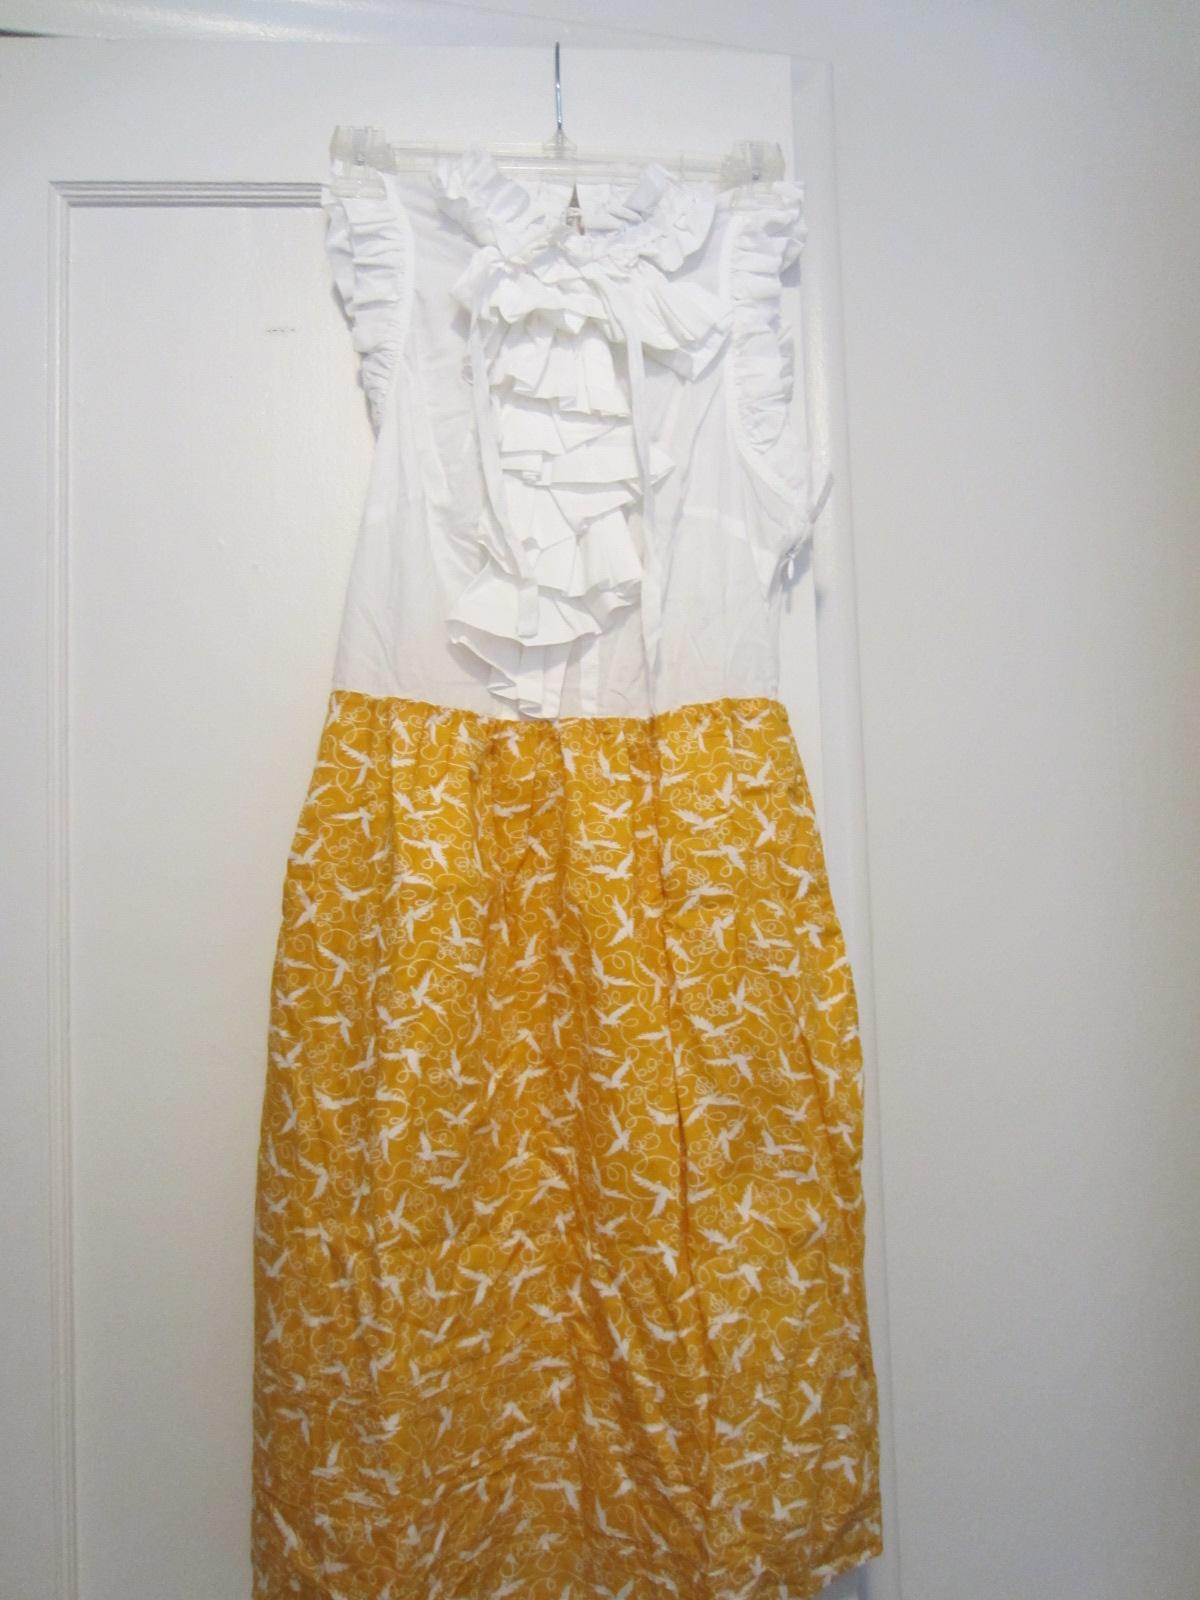 66114d2ca82f Anthro Galore Closet Sale: NWOT Anthropologie Sunny Soiree dress ...